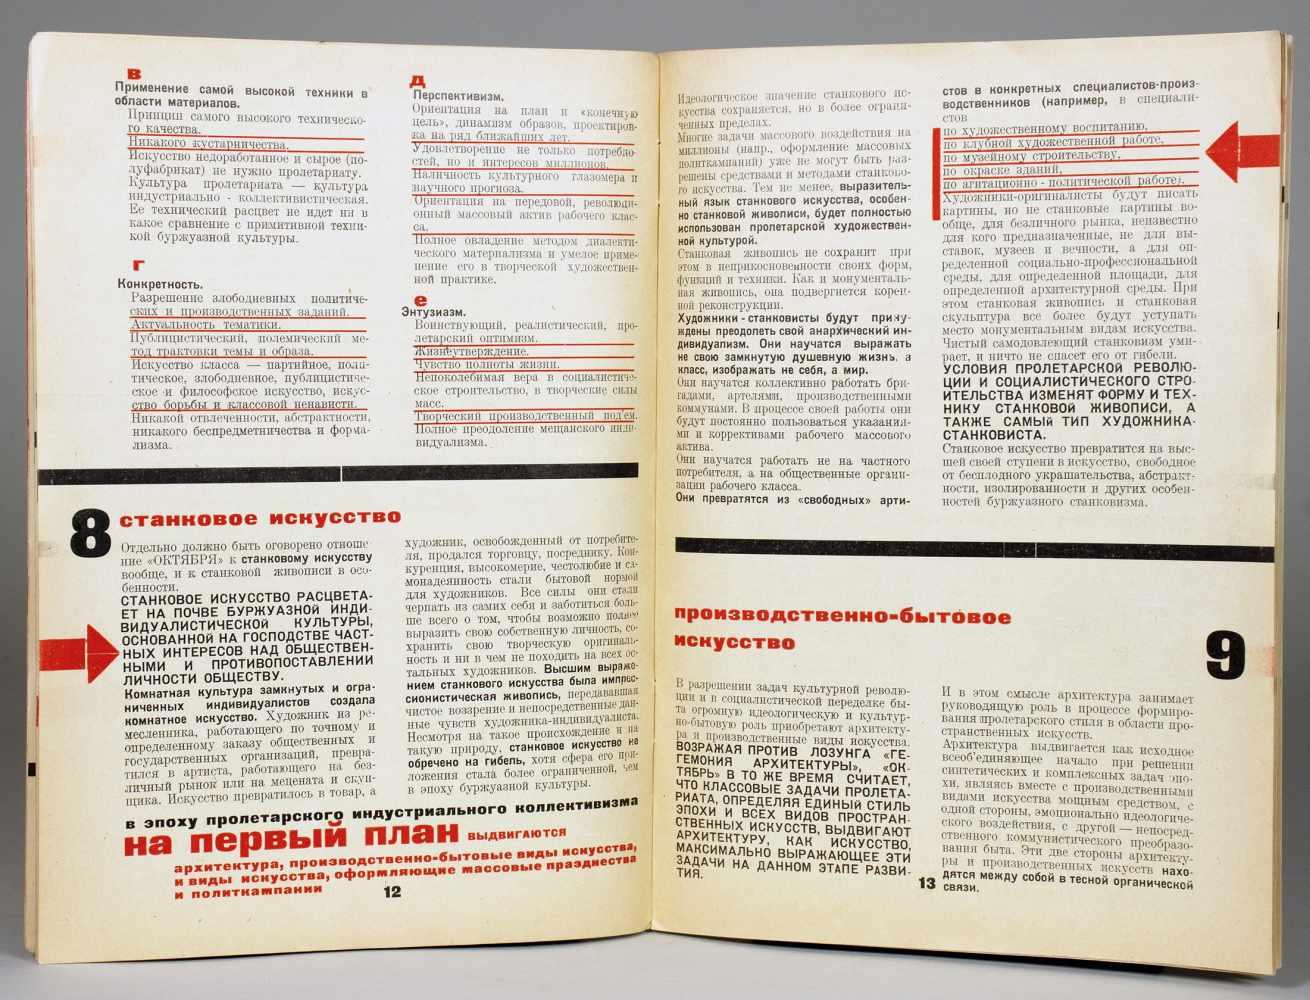 S. B. Telingater, E. Gutnov und N. Spirov. Oktjabr (russisch: Oktober). Borba sa proletarskije